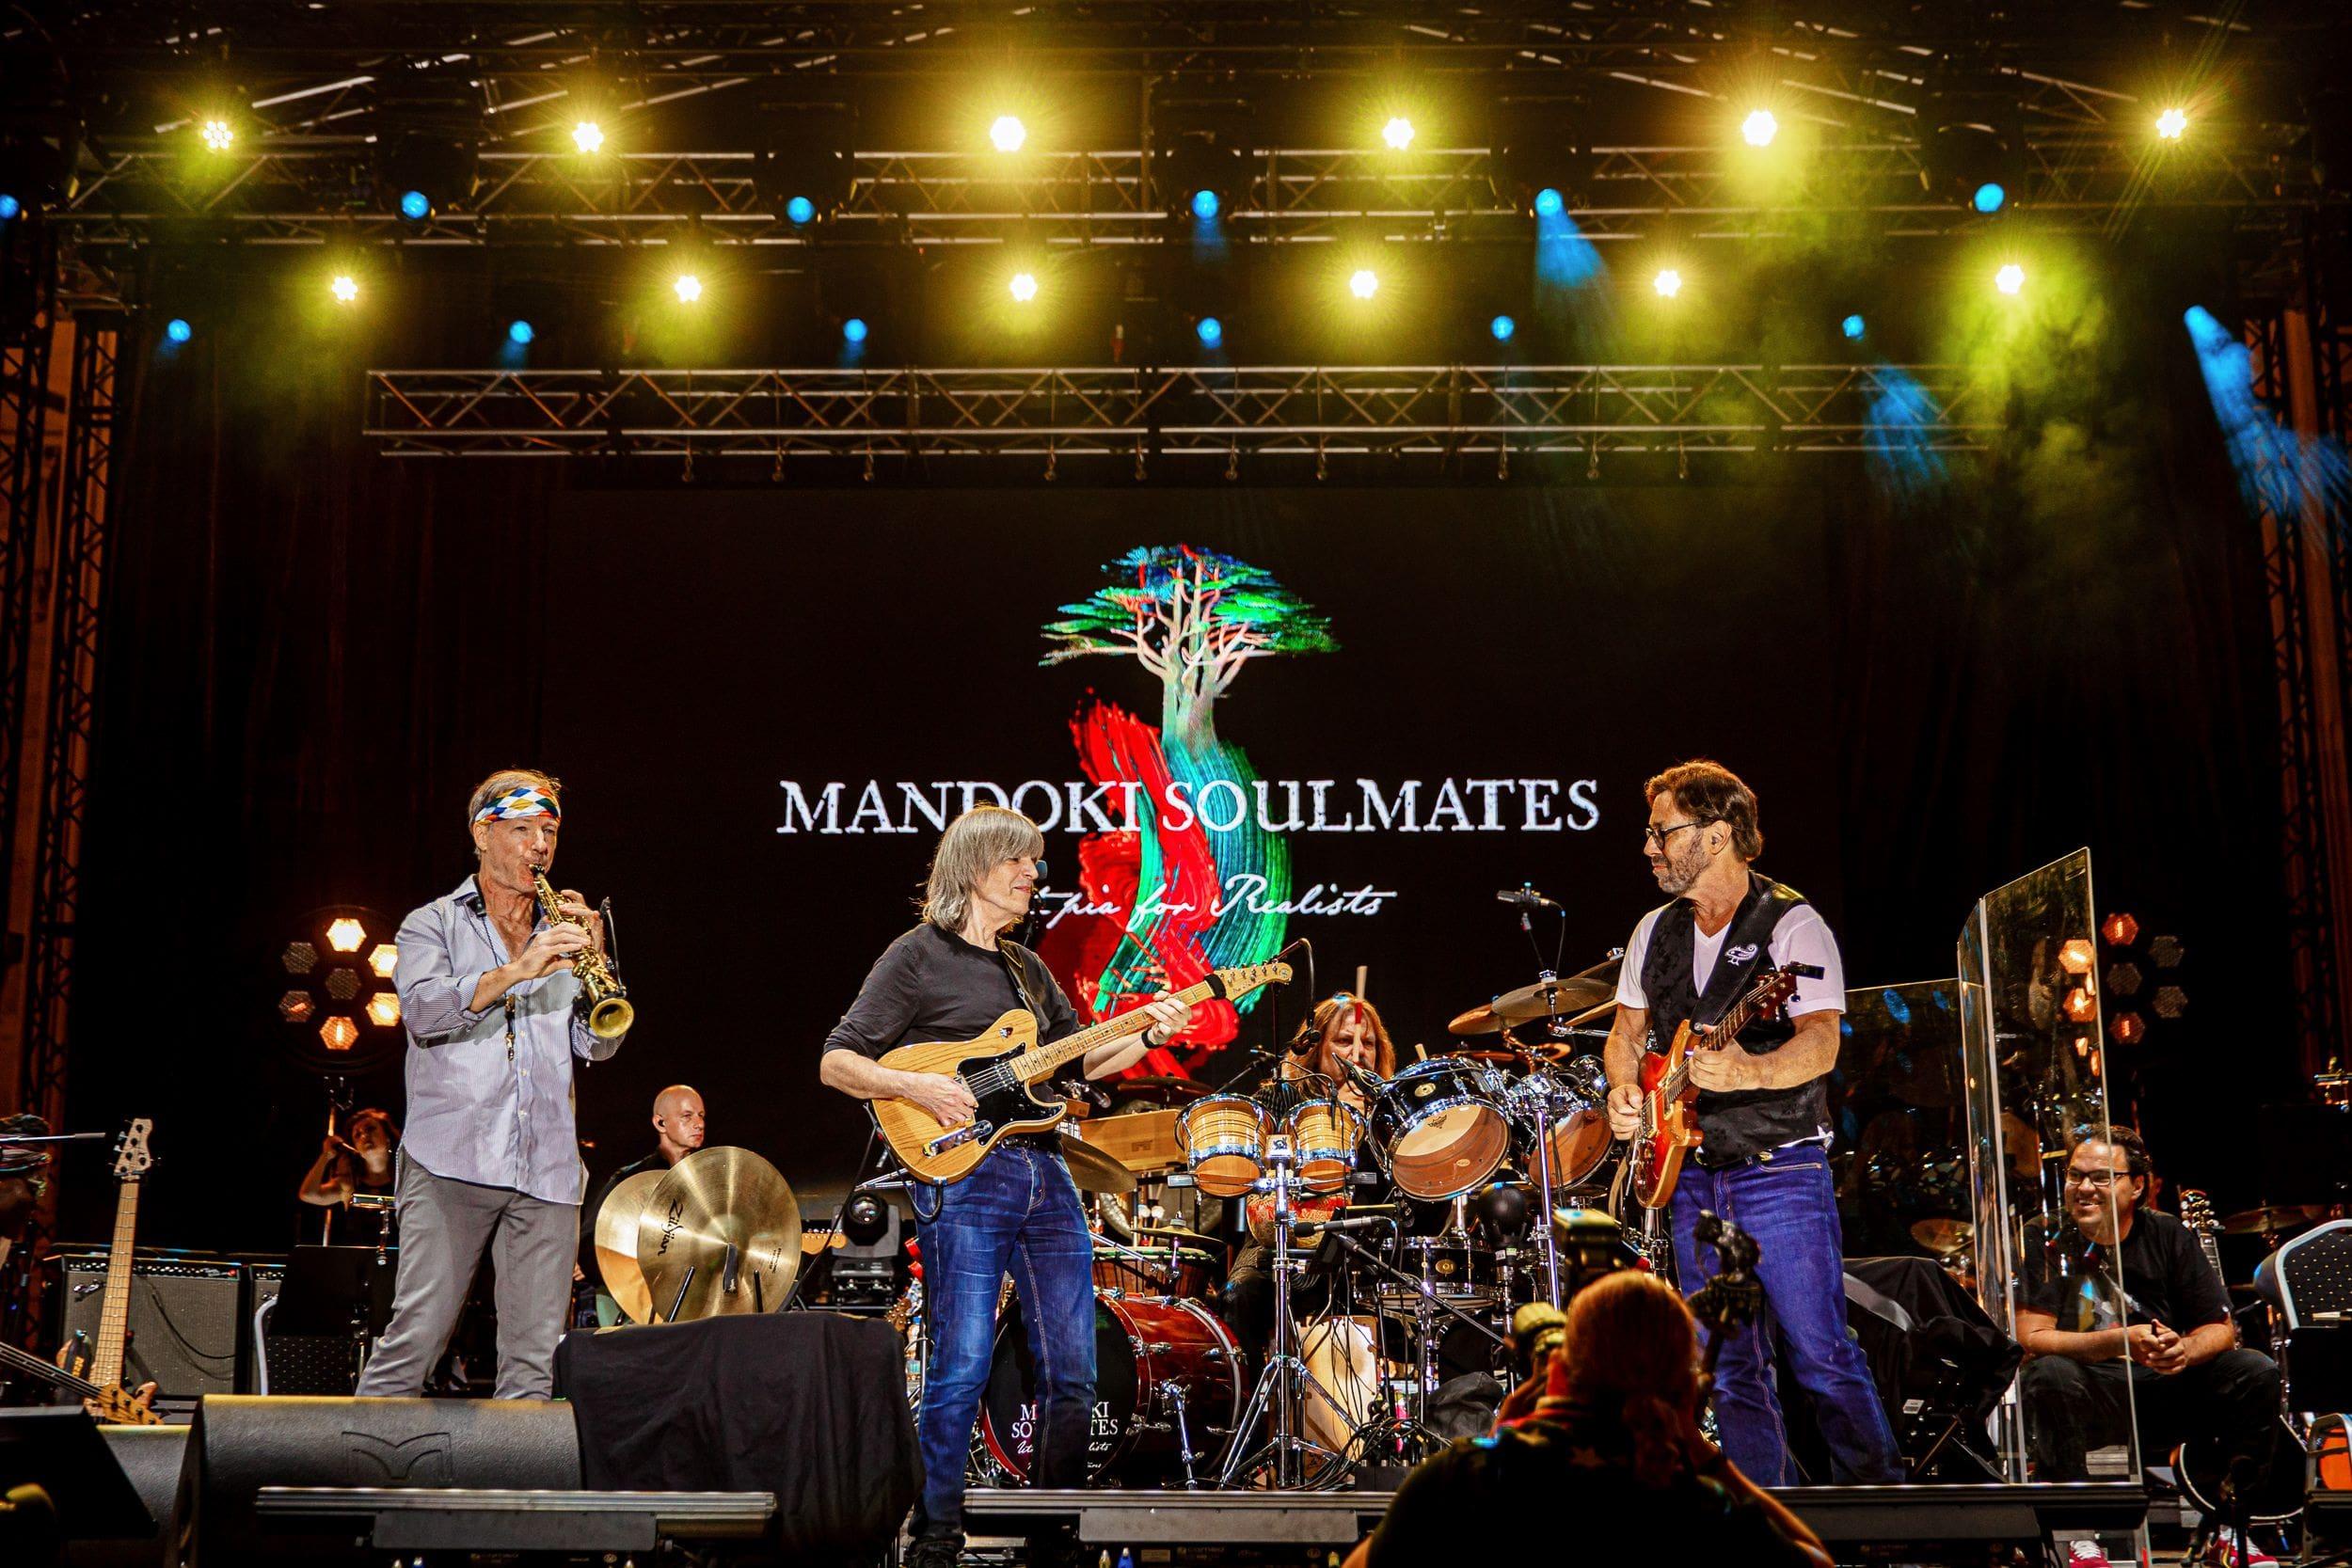 MANDOKI SOULMATES Budapest 2021 Bill Evans & Mike Stern & Leslie & Al di Meola